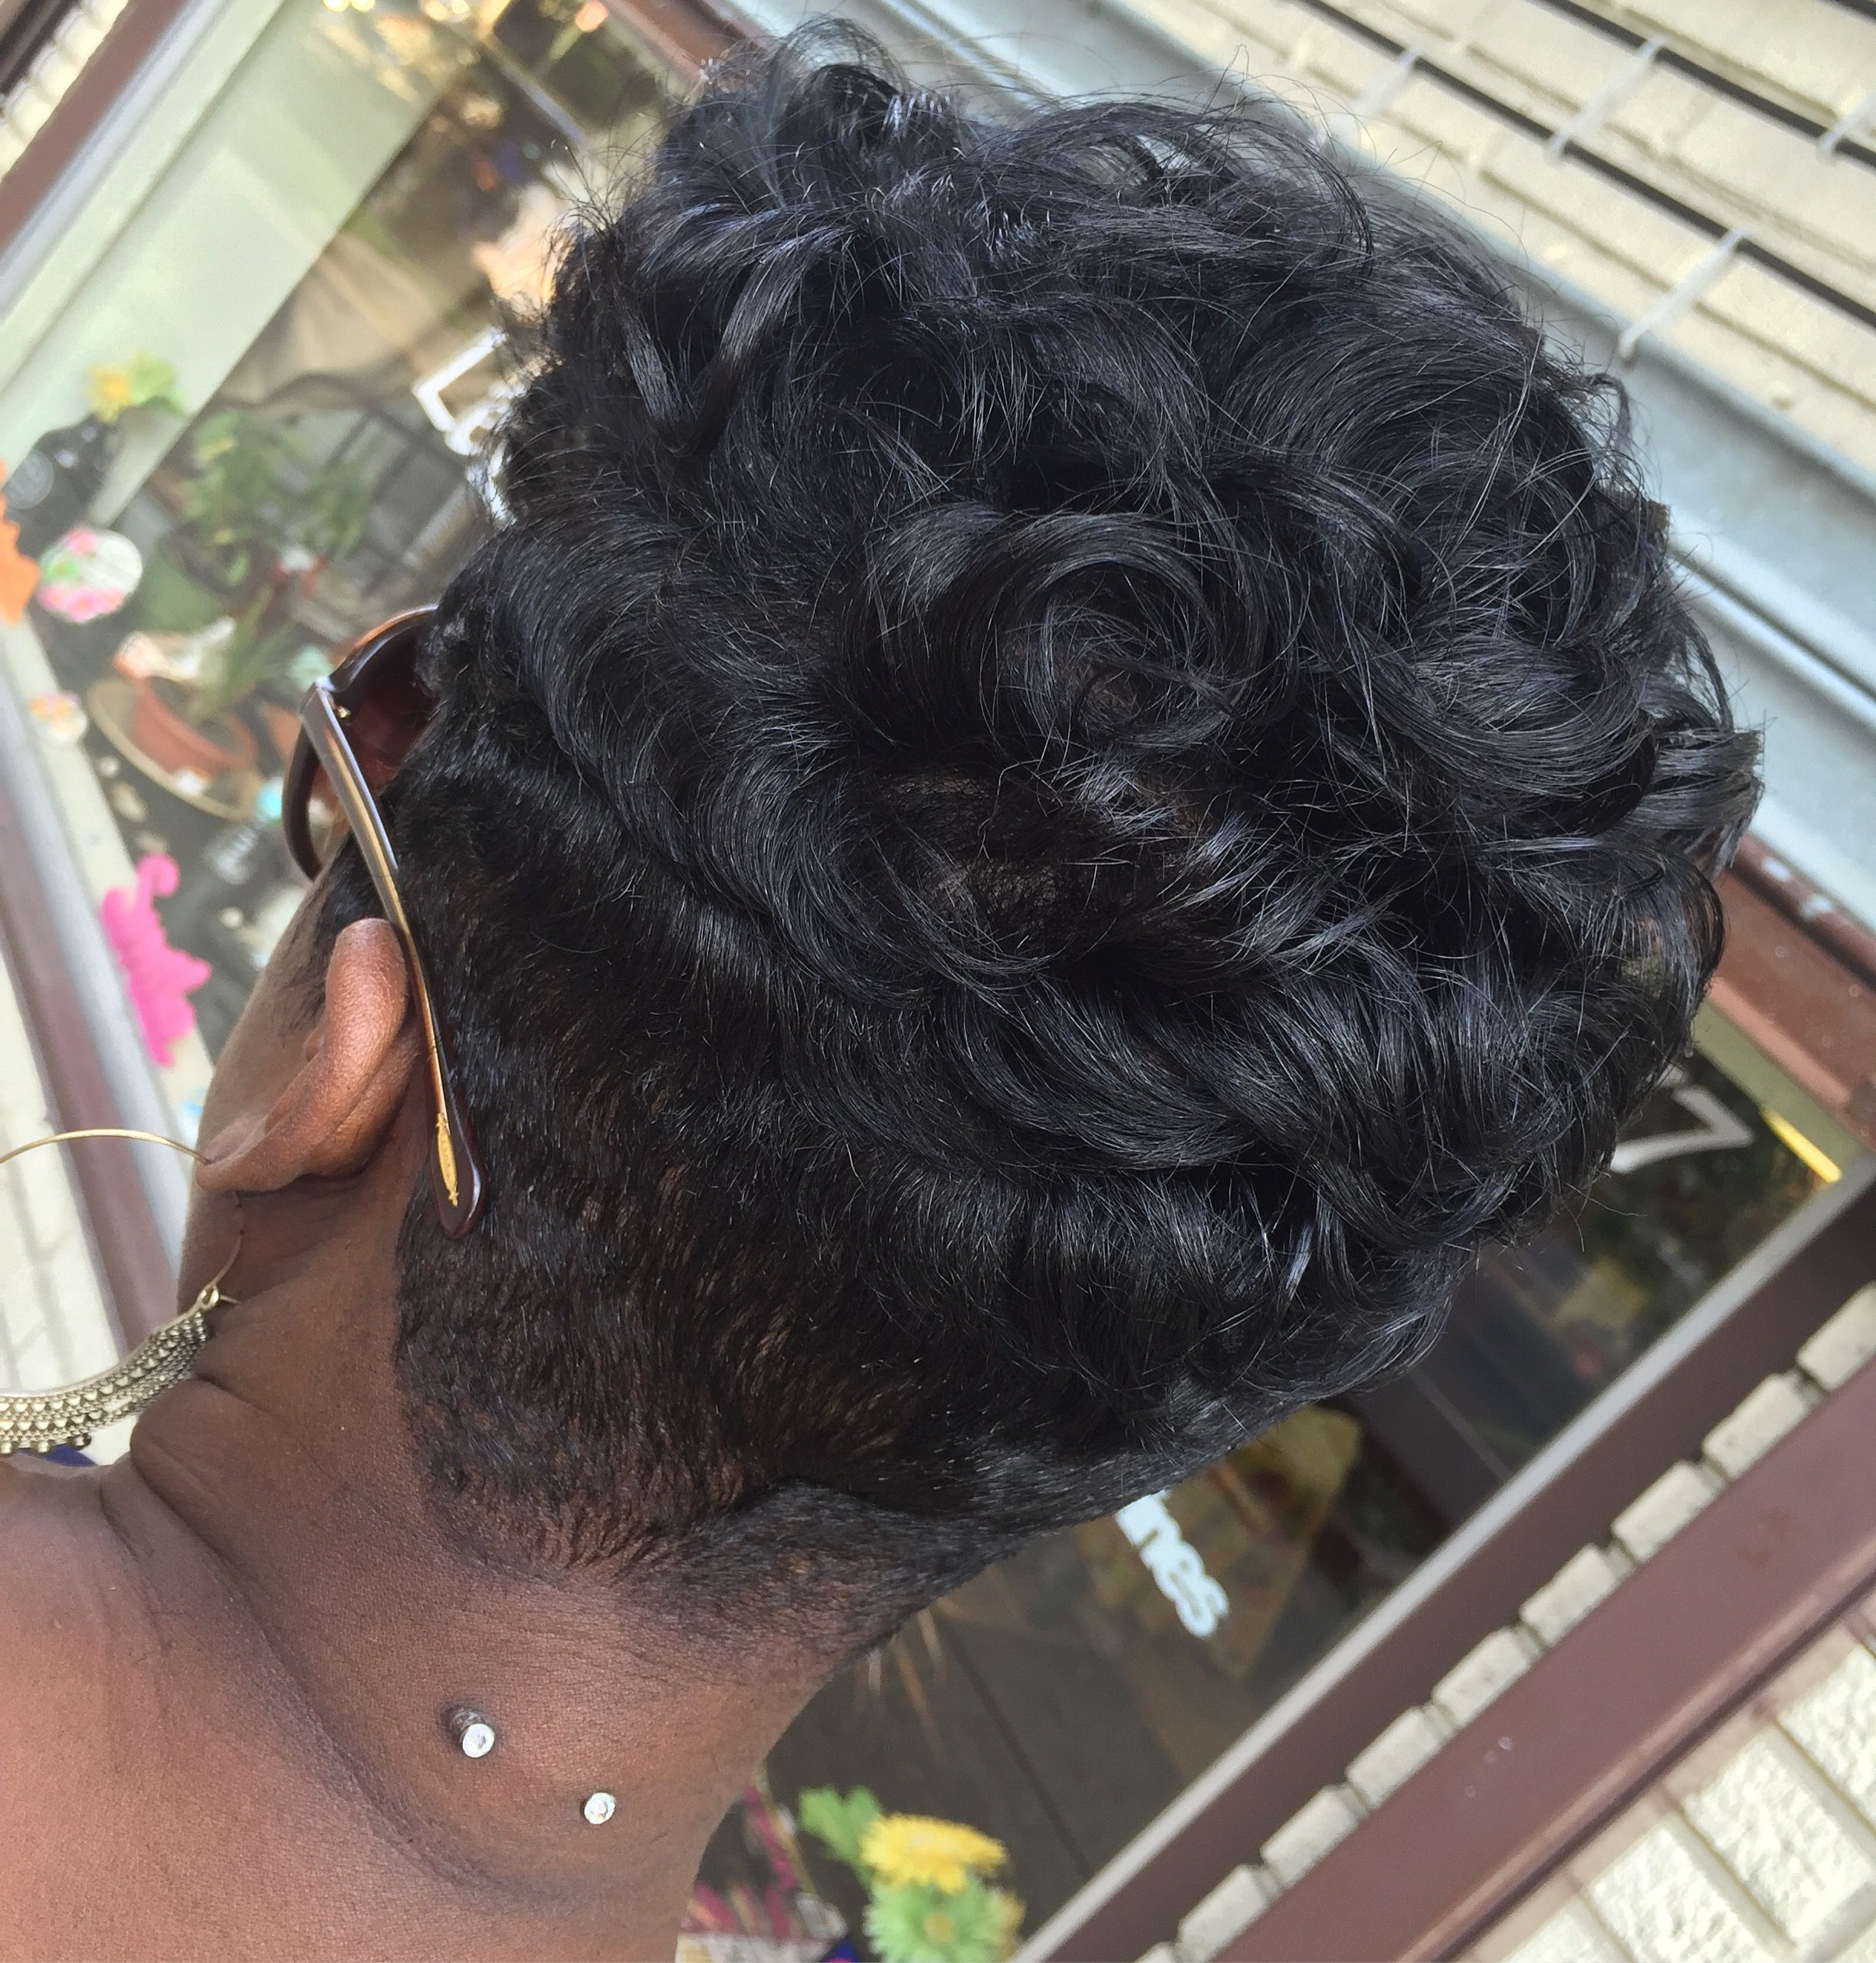 She S Been Heatherfyed Relaxer Free Hair Stylist Marketia Le Loft Llc Hair Salon Philadelphia Pa Natural Hair Styles Hair Beauty Creative Hairstyles